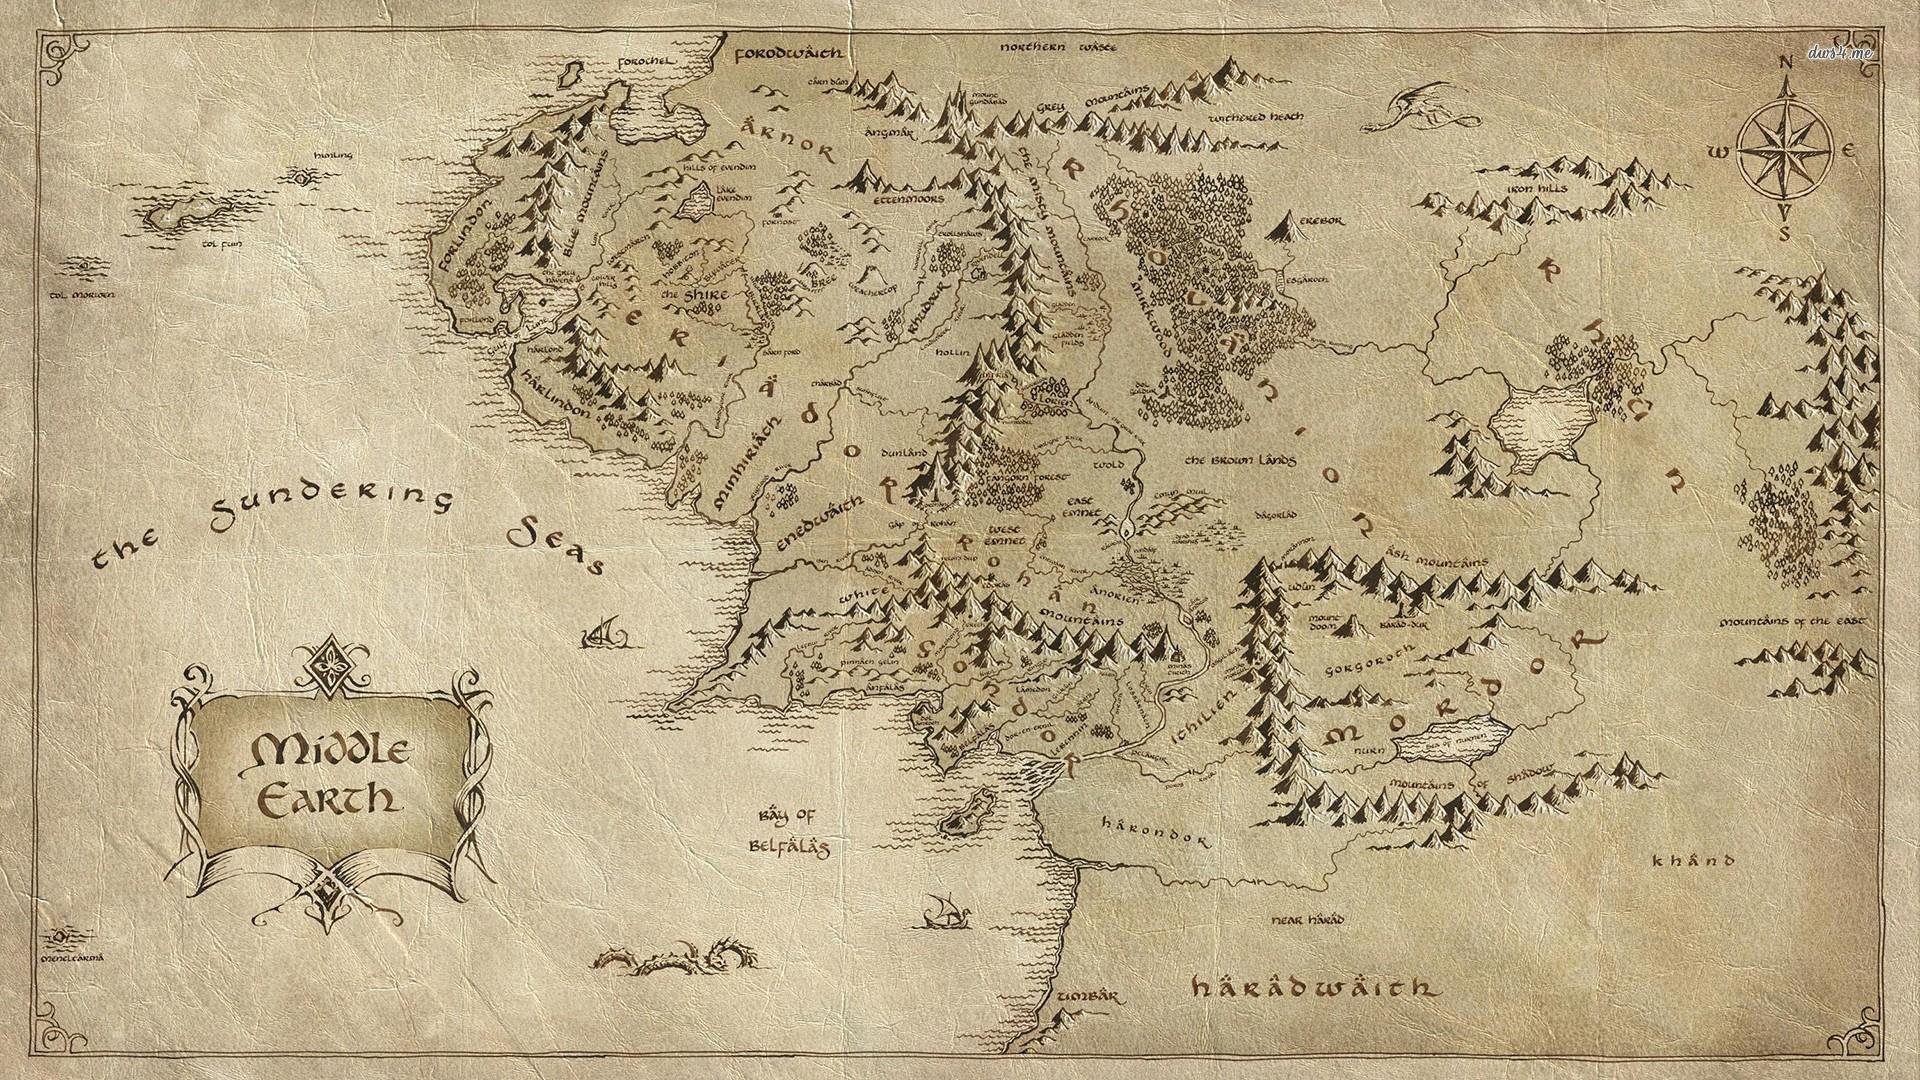 Tapety Dejiny Mapa Pan Prstenu Stredozem J R R Tolkien Font